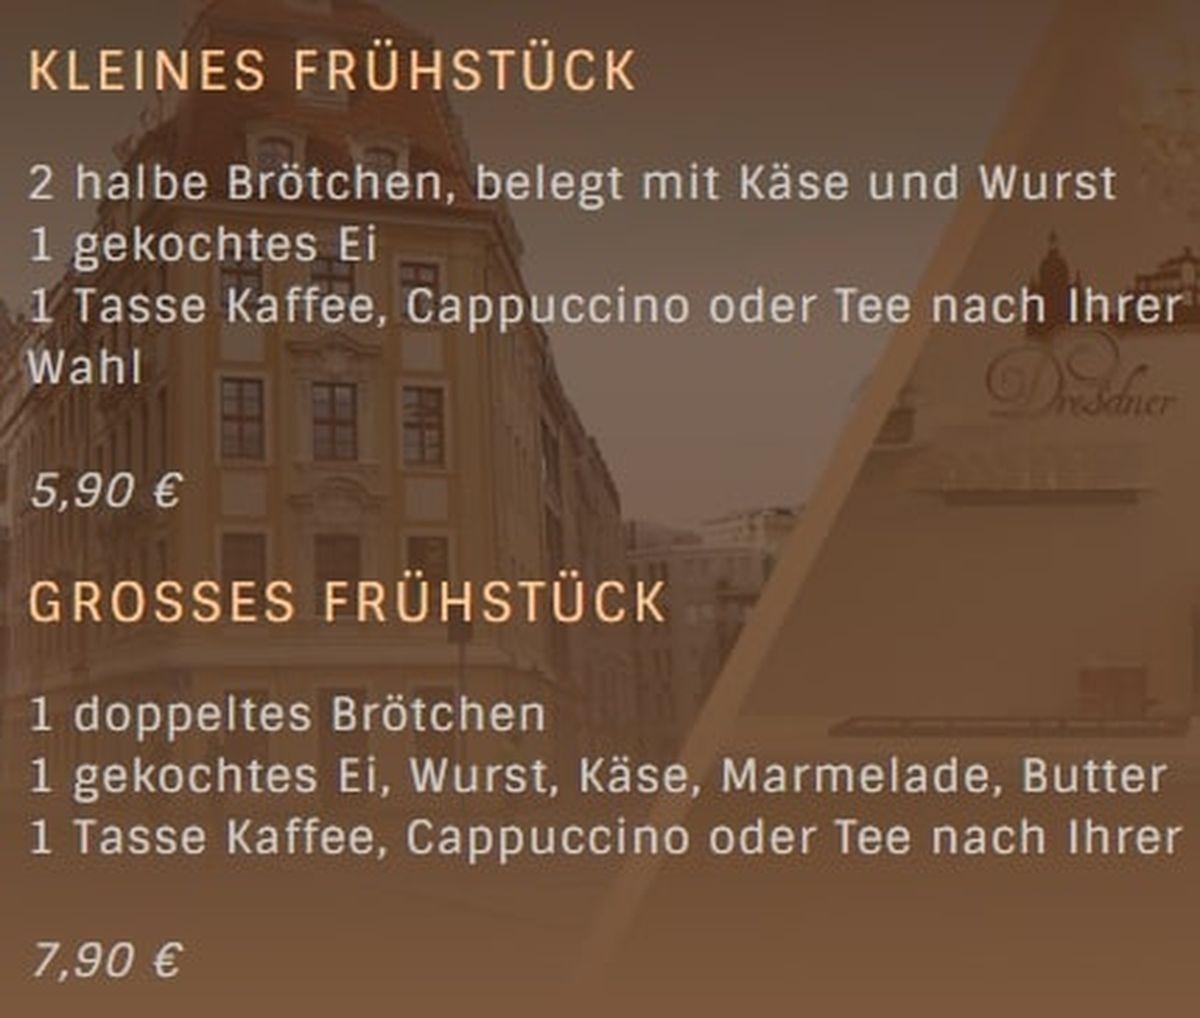 Меню кафе Dresdner Kaffeestuebchen